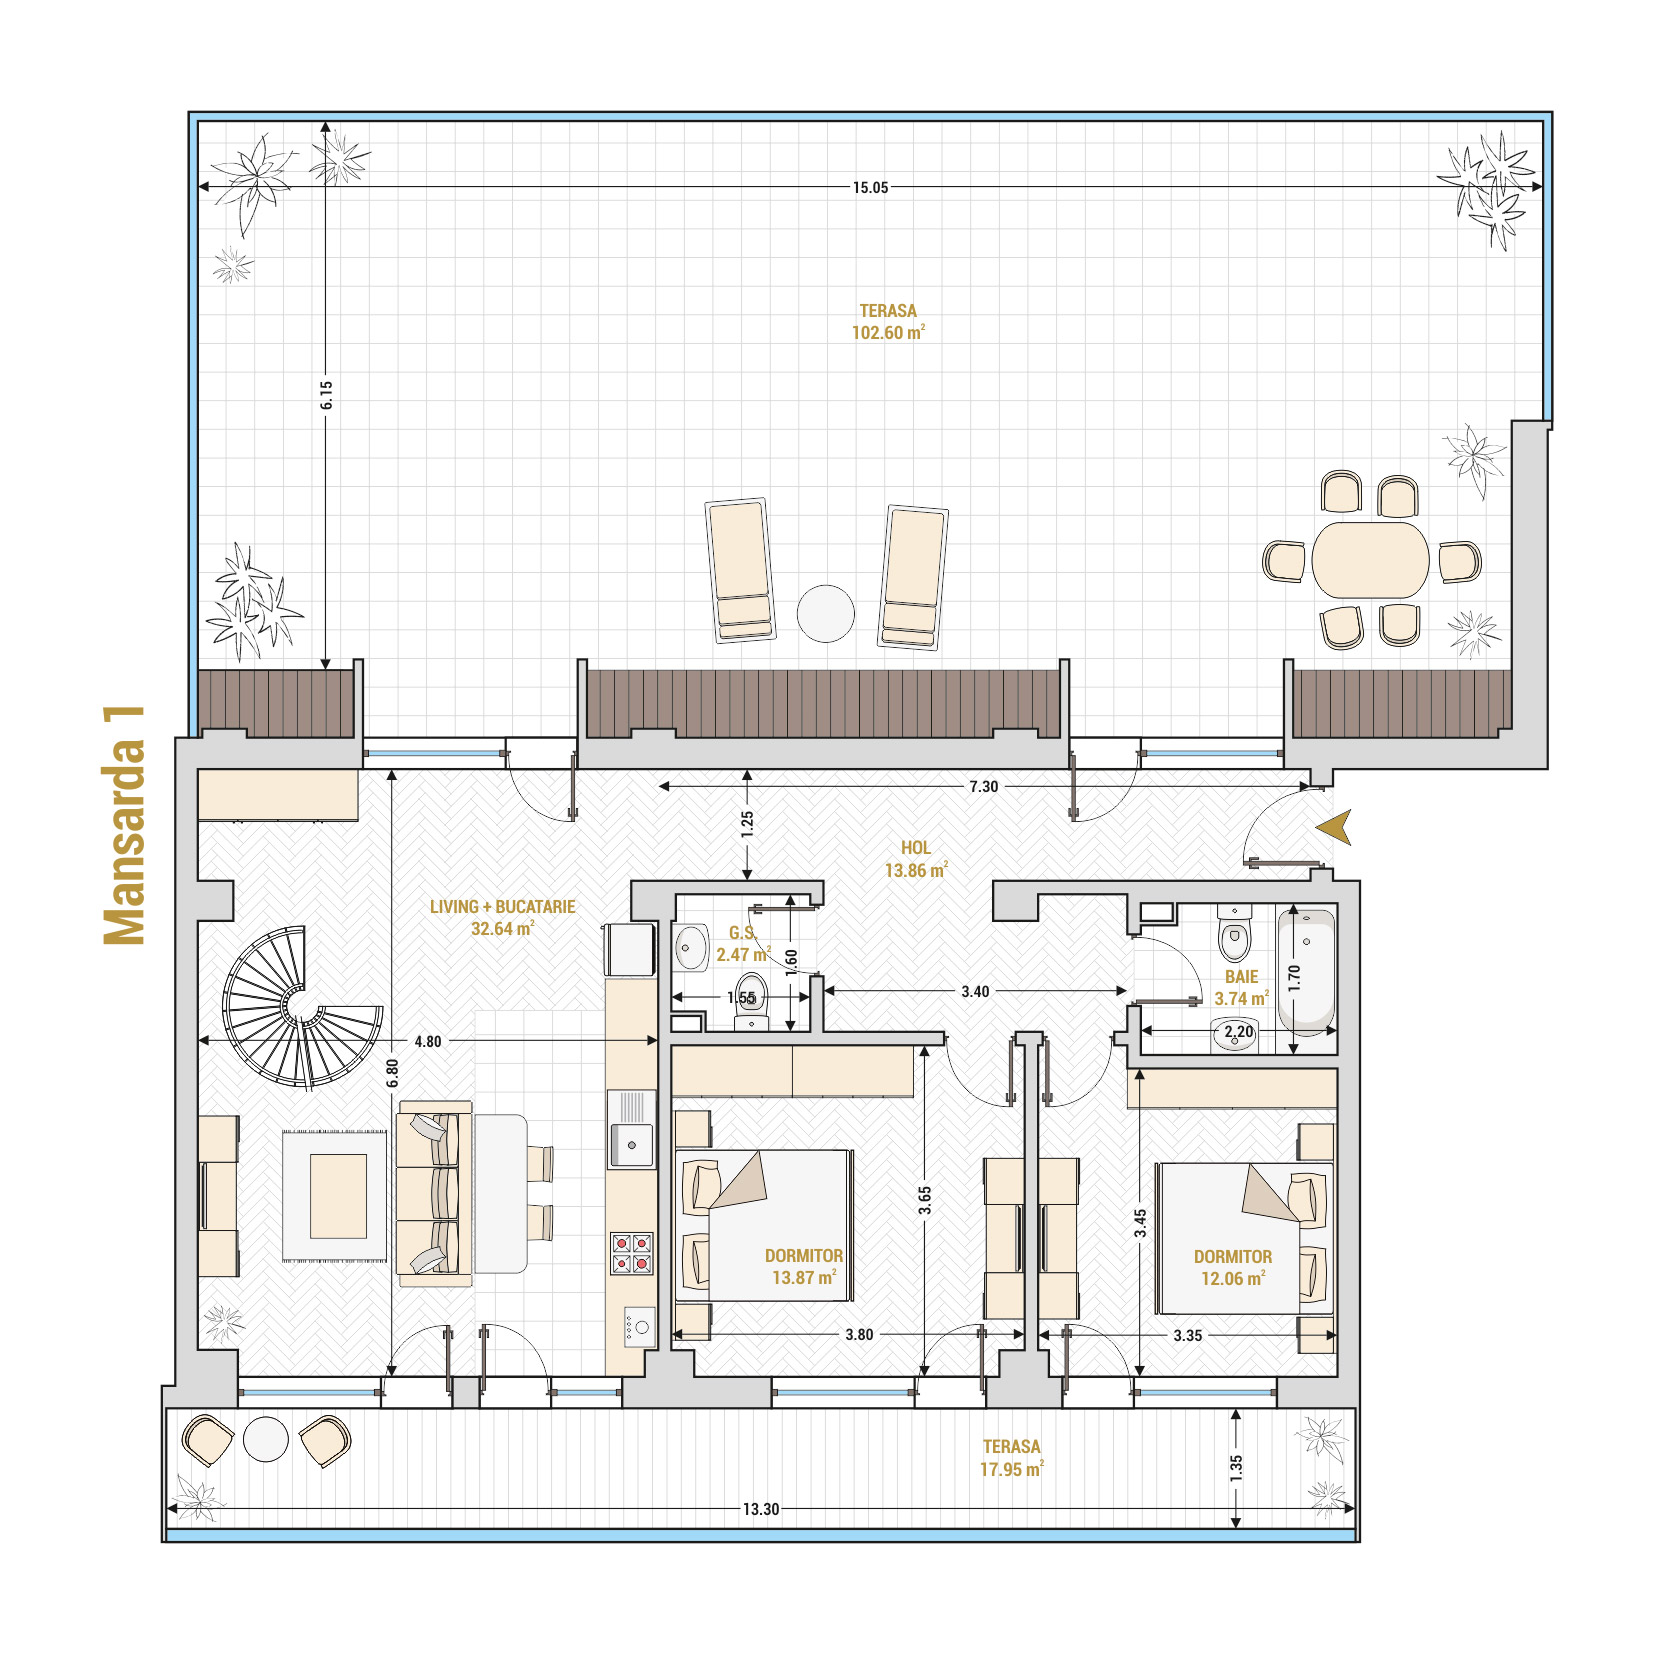 Duplex 5 camere de vanzare Bucuresti - Catedral Residence - Marriott, Piata Unirii, 13 Septembrie, Izvor - T2 - A